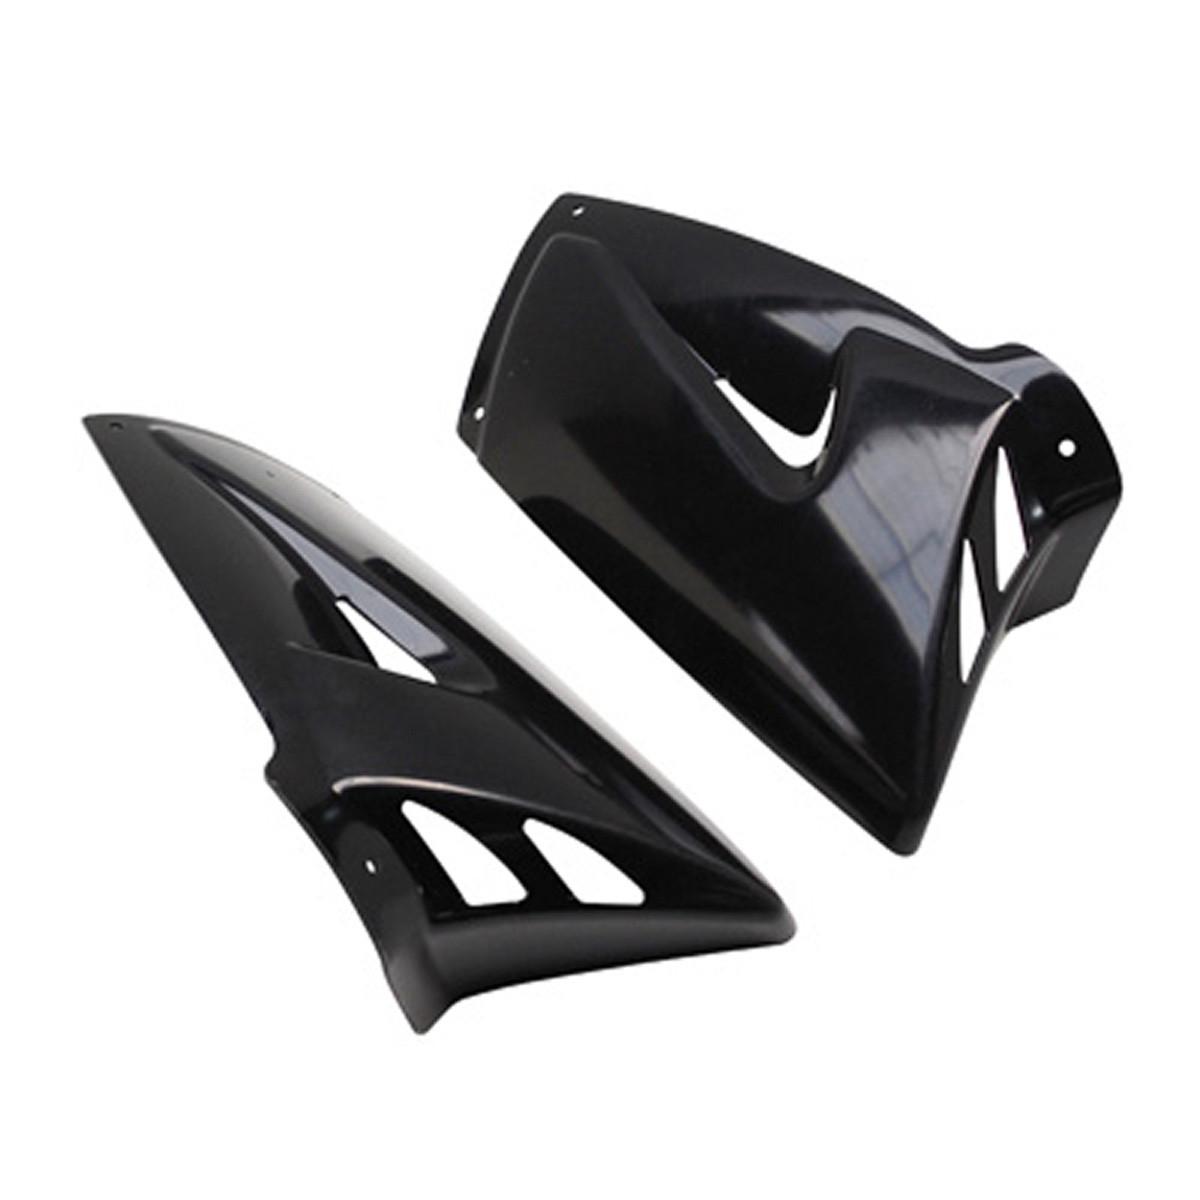 Sabot Moteur BCD PEUGEOT Ludix blaster - BCD Xtreme Noir